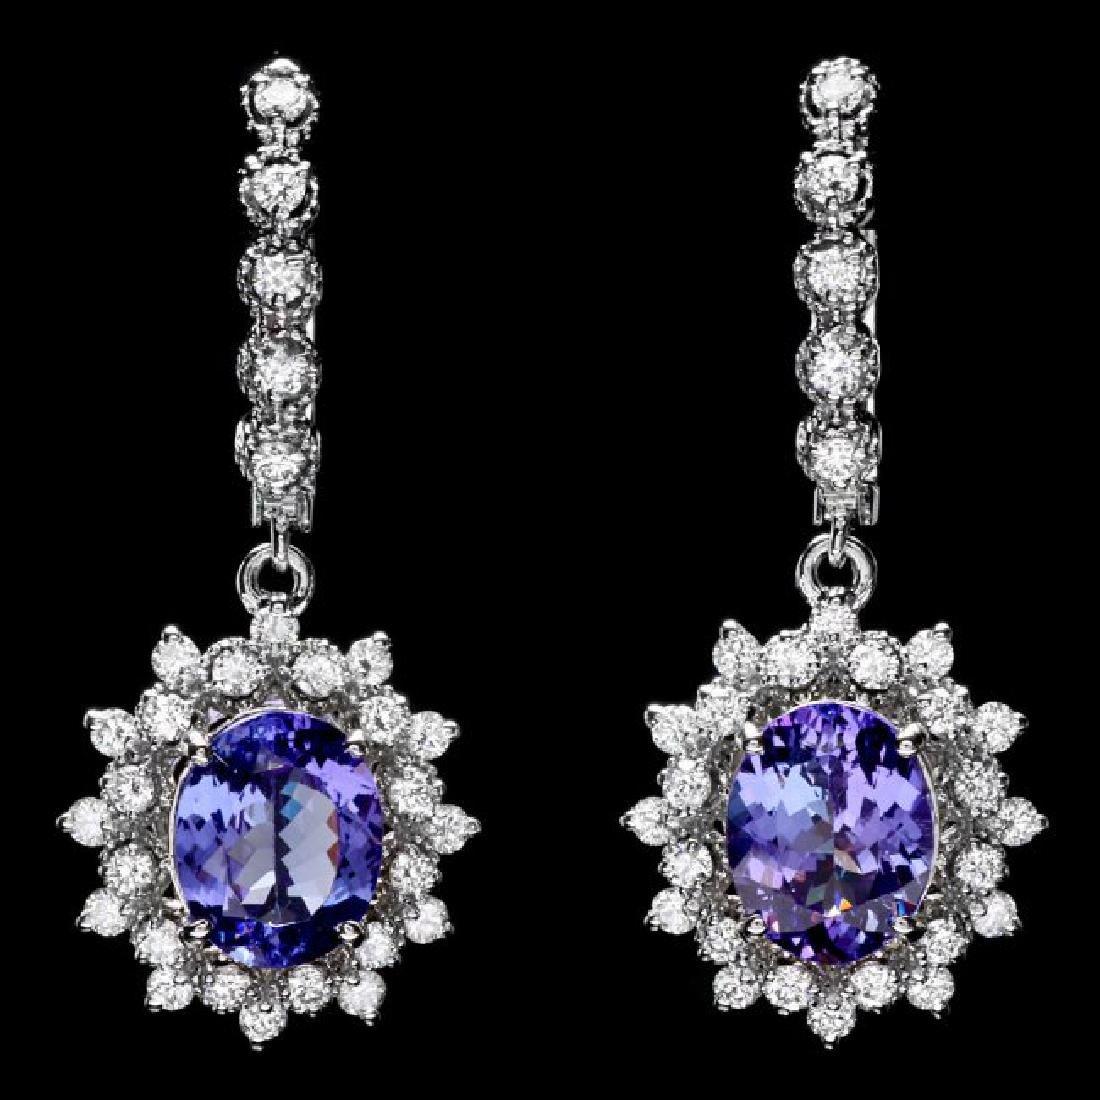 14k Gold 5ct Tanzanite 1.60ct Diamond Earrings